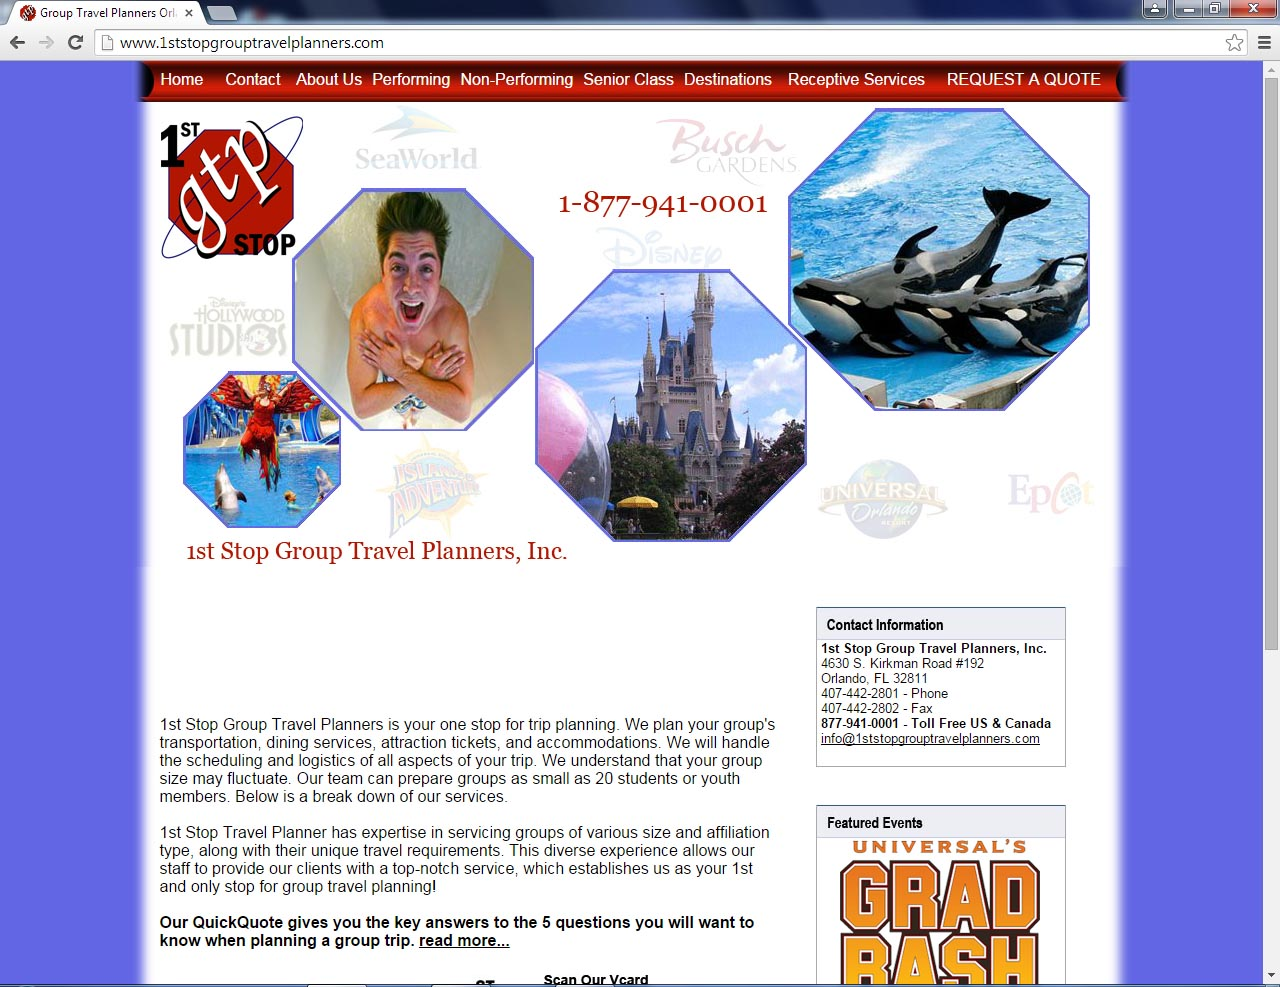 Orlando Website Design Sample 1